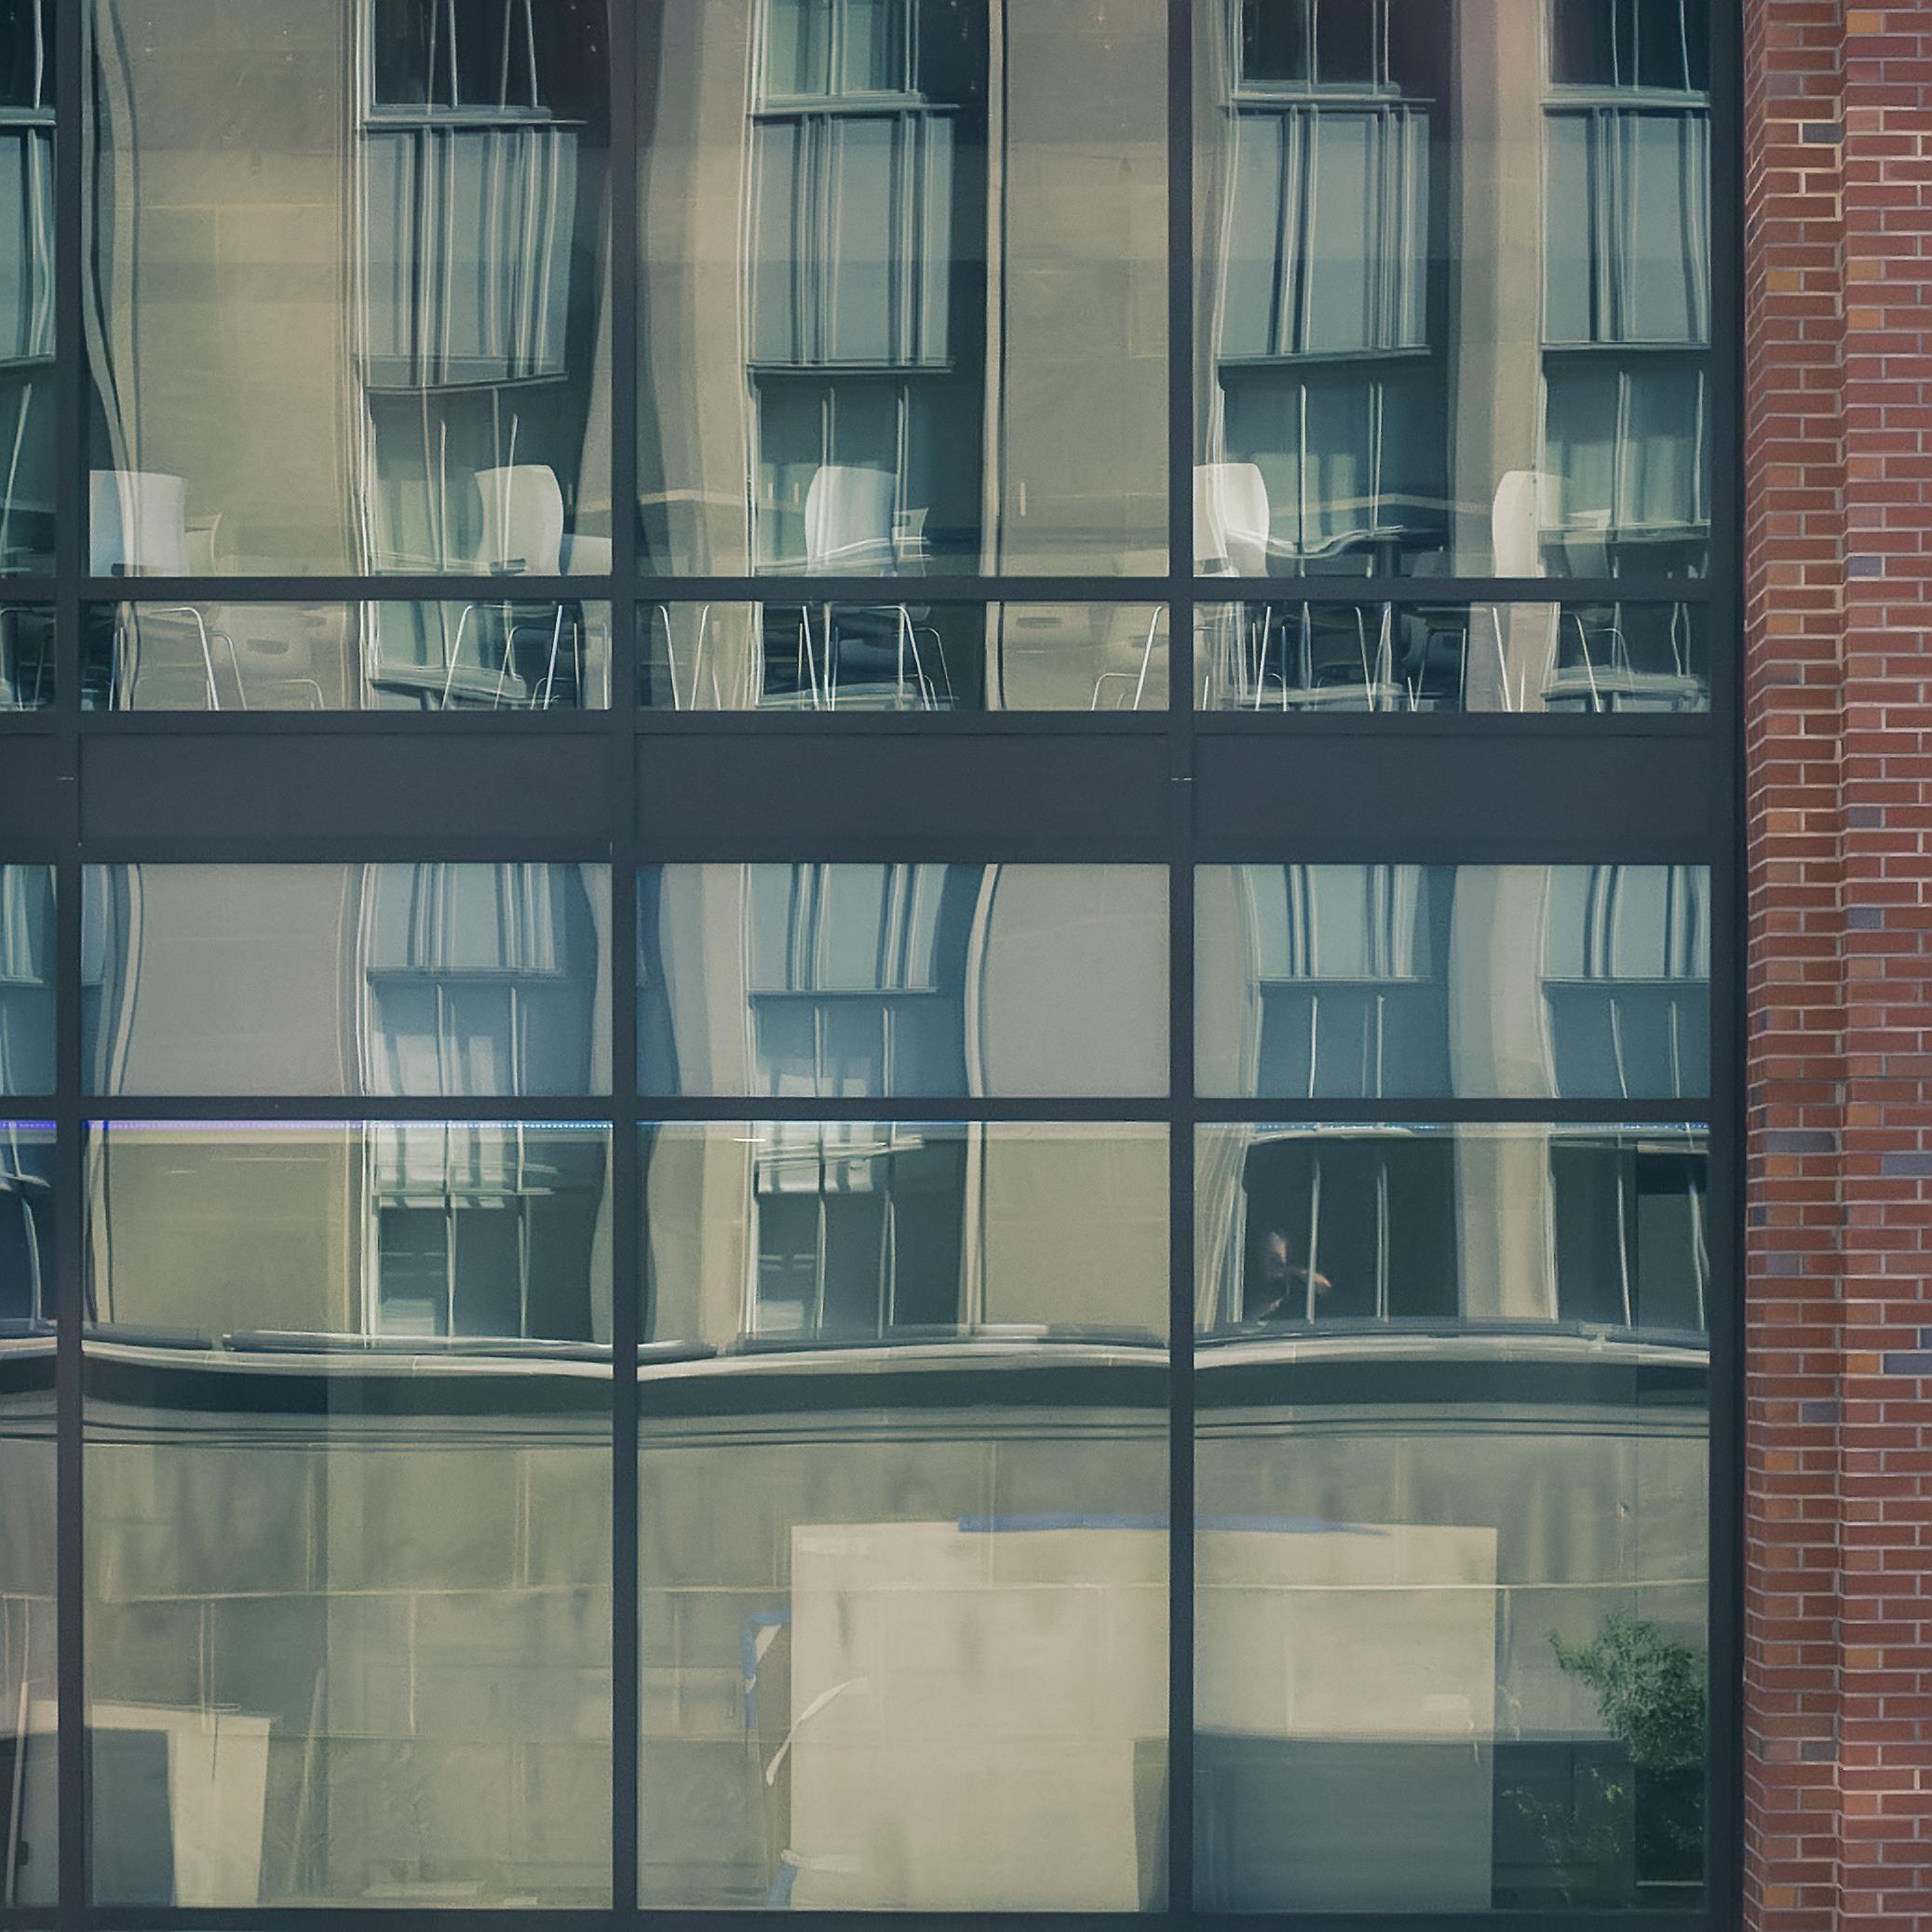 Durham_21cDurham_SelfReflectionCityCenter_10132018.jpg